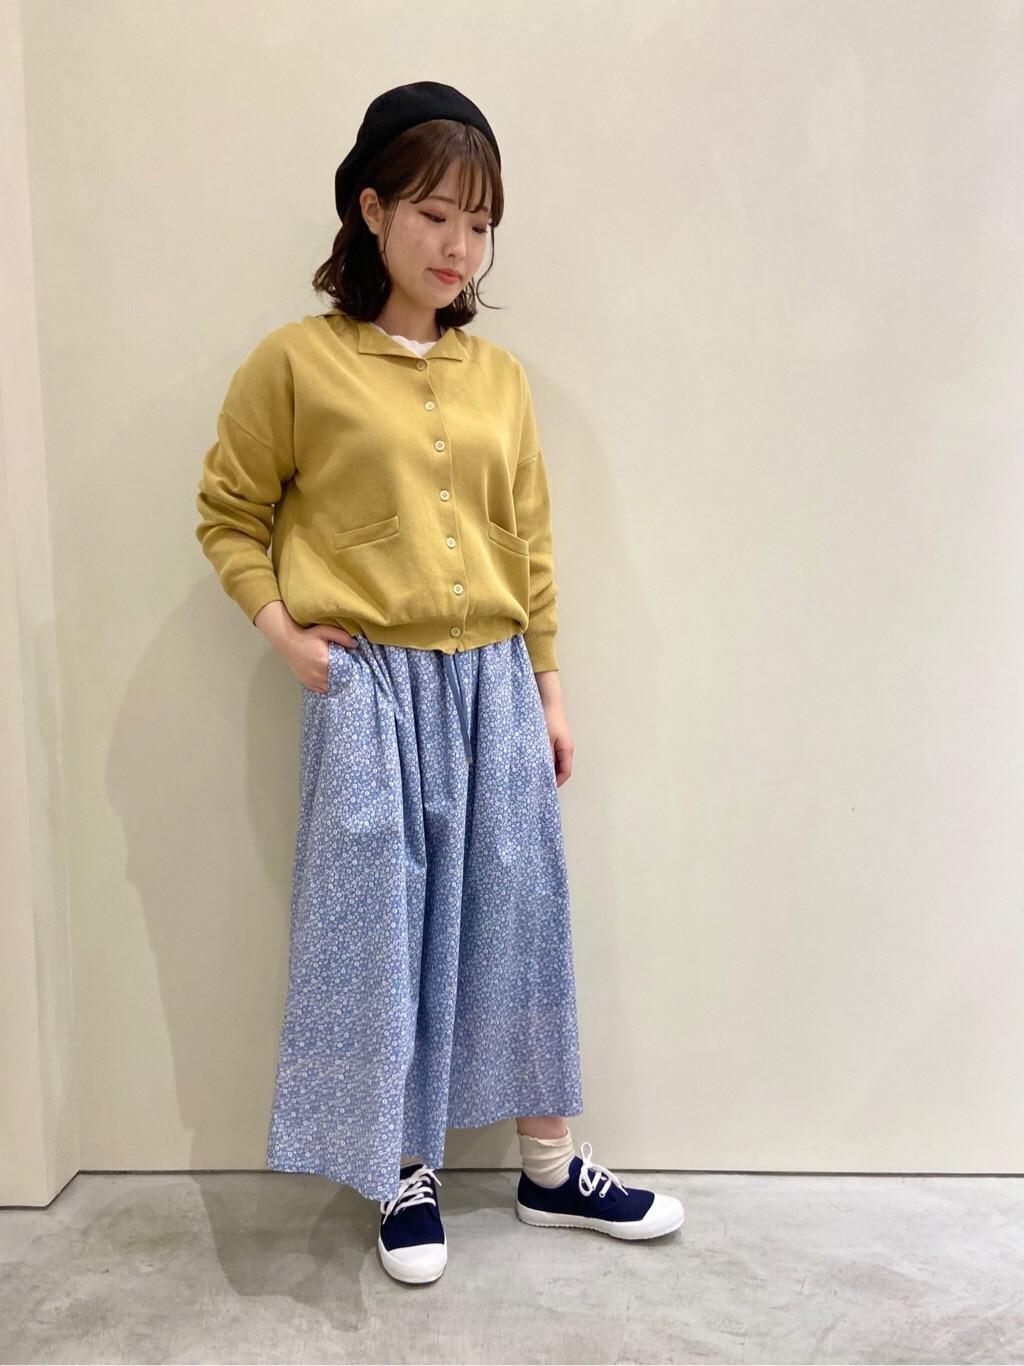 Dot and Stripes CHILD WOMAN CHILD WOMAN , PAR ICI 新宿ミロード 身長:160cm 2021.01.19